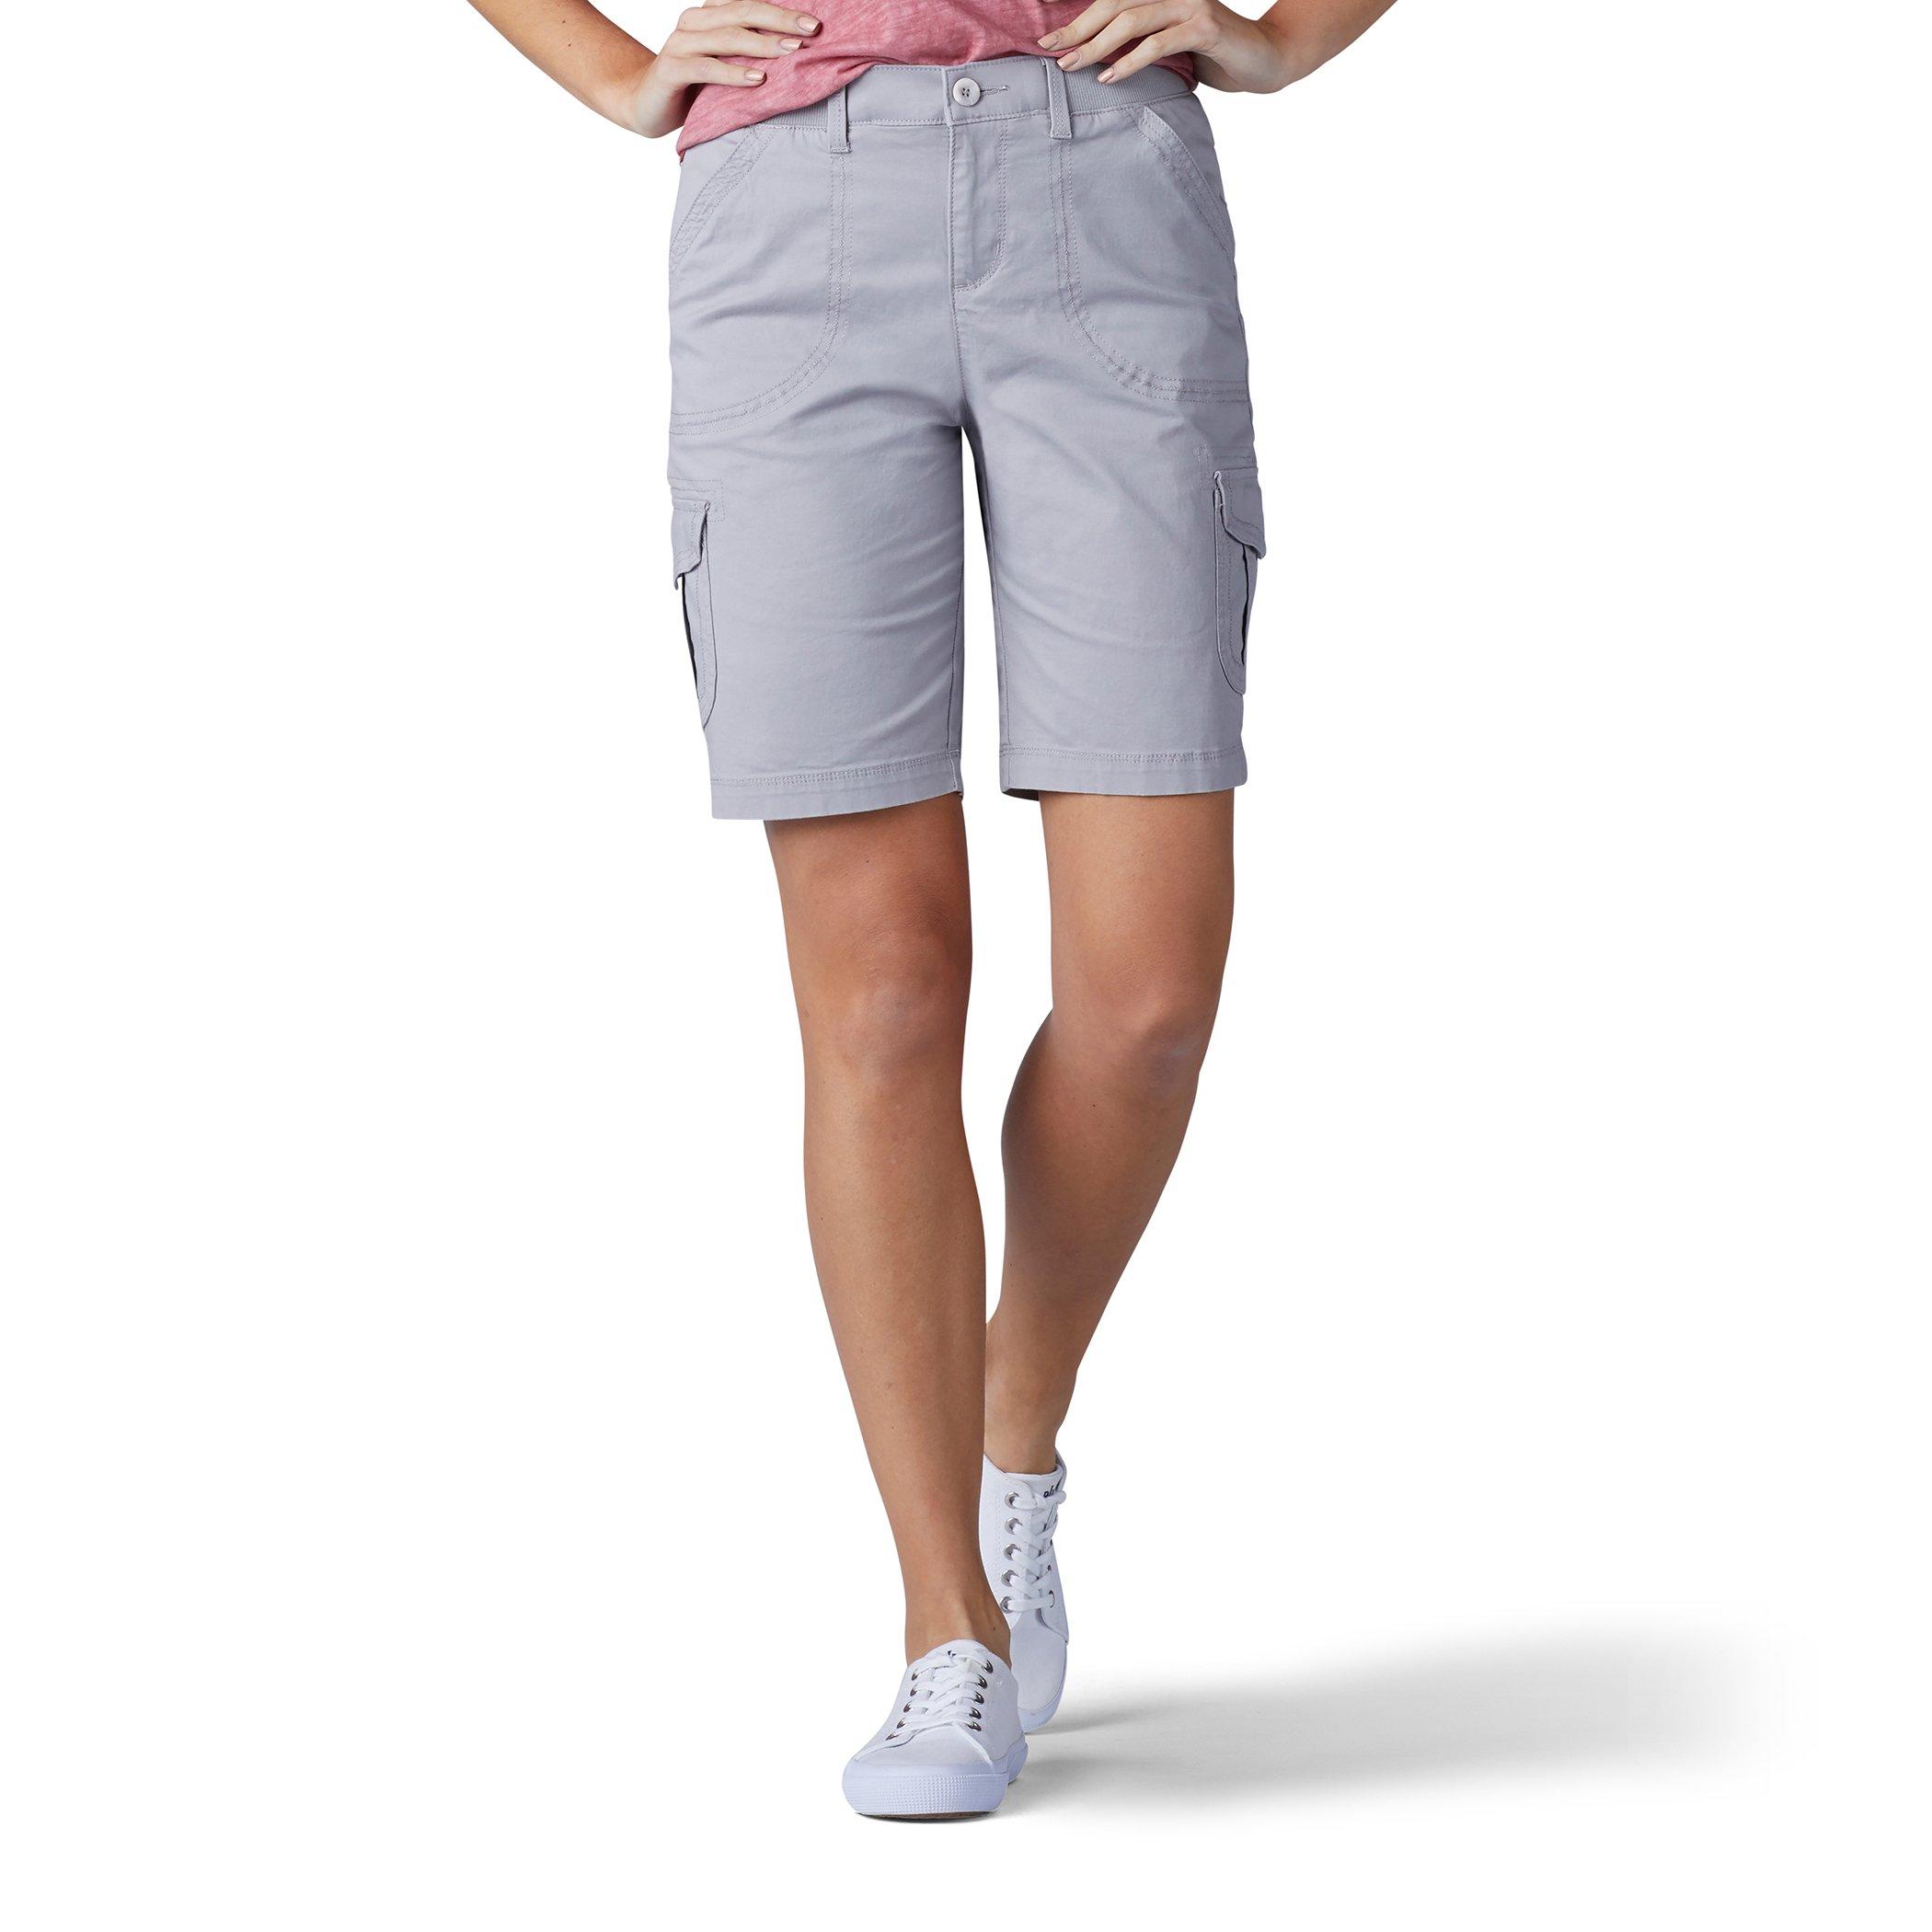 LEE Women's Relaxed Fit Diani Knit Waist Bermuda Short, Alloy, 16